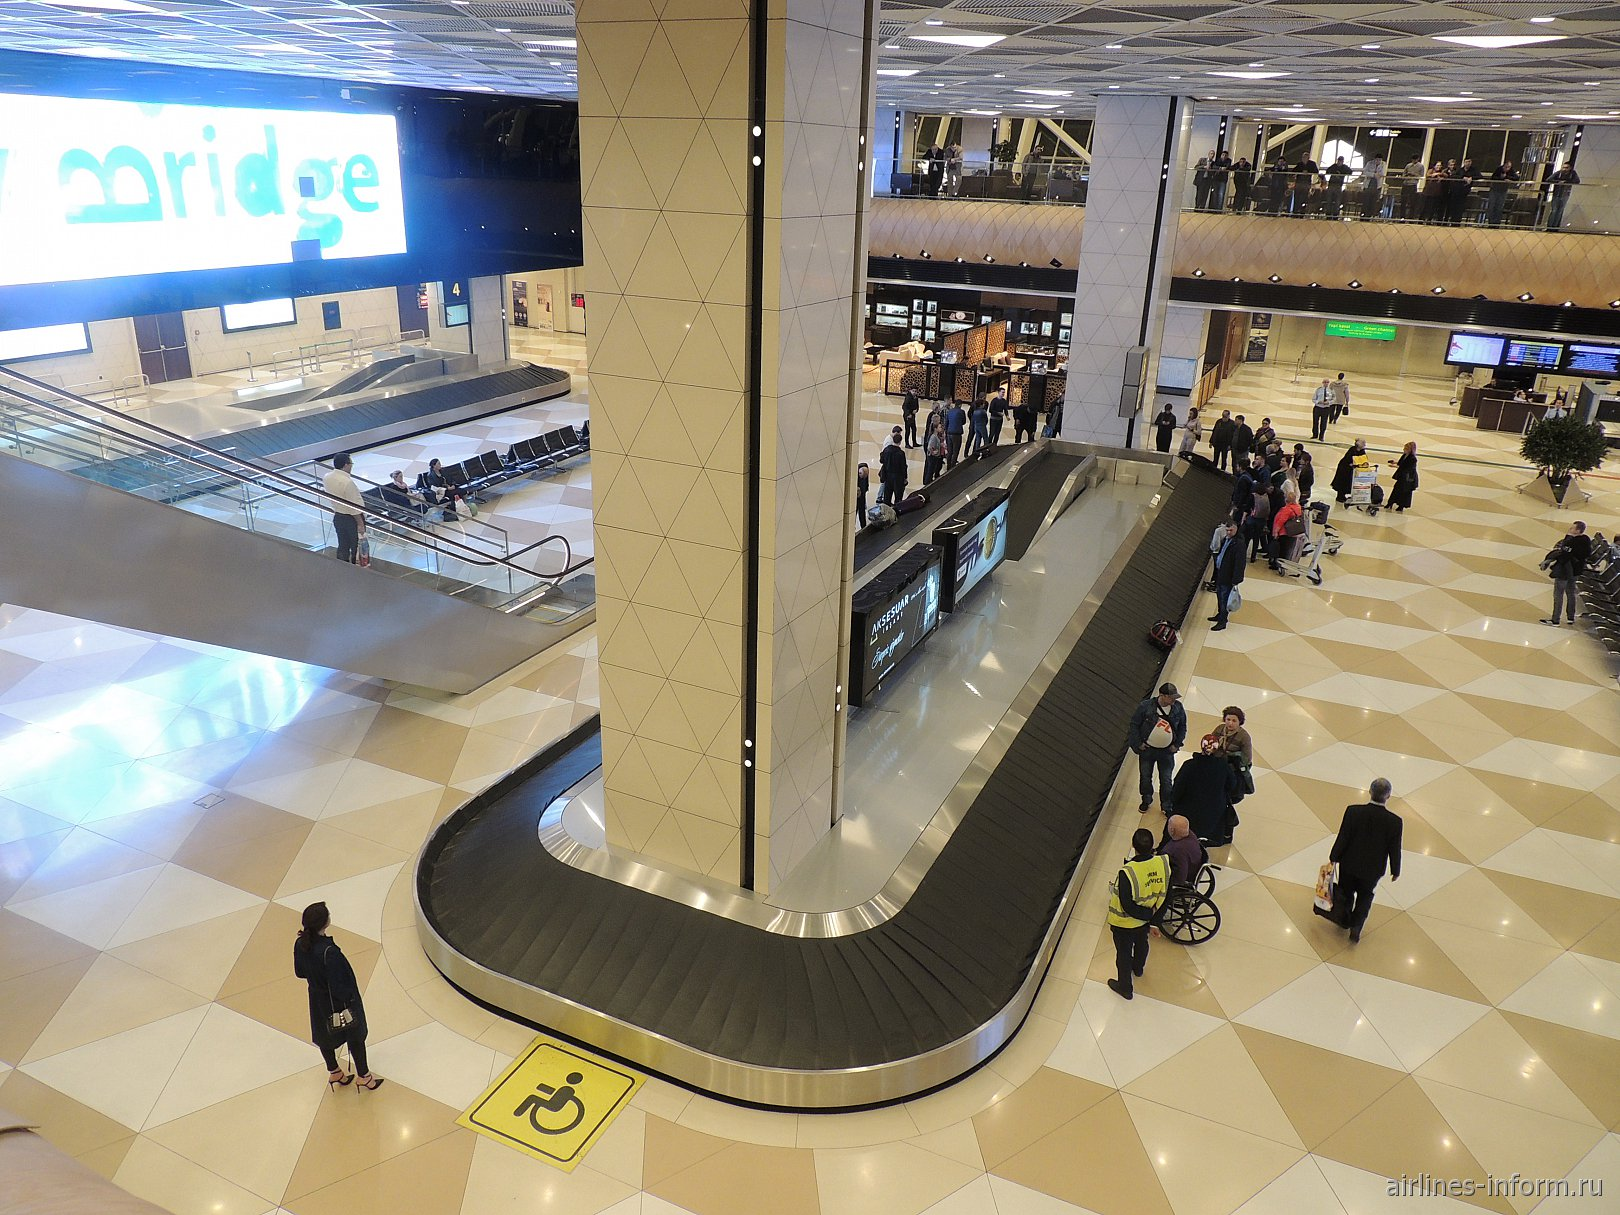 Зал выдачи багажа в терминале 1 аэропорта Баку имени Гейдара Алиева